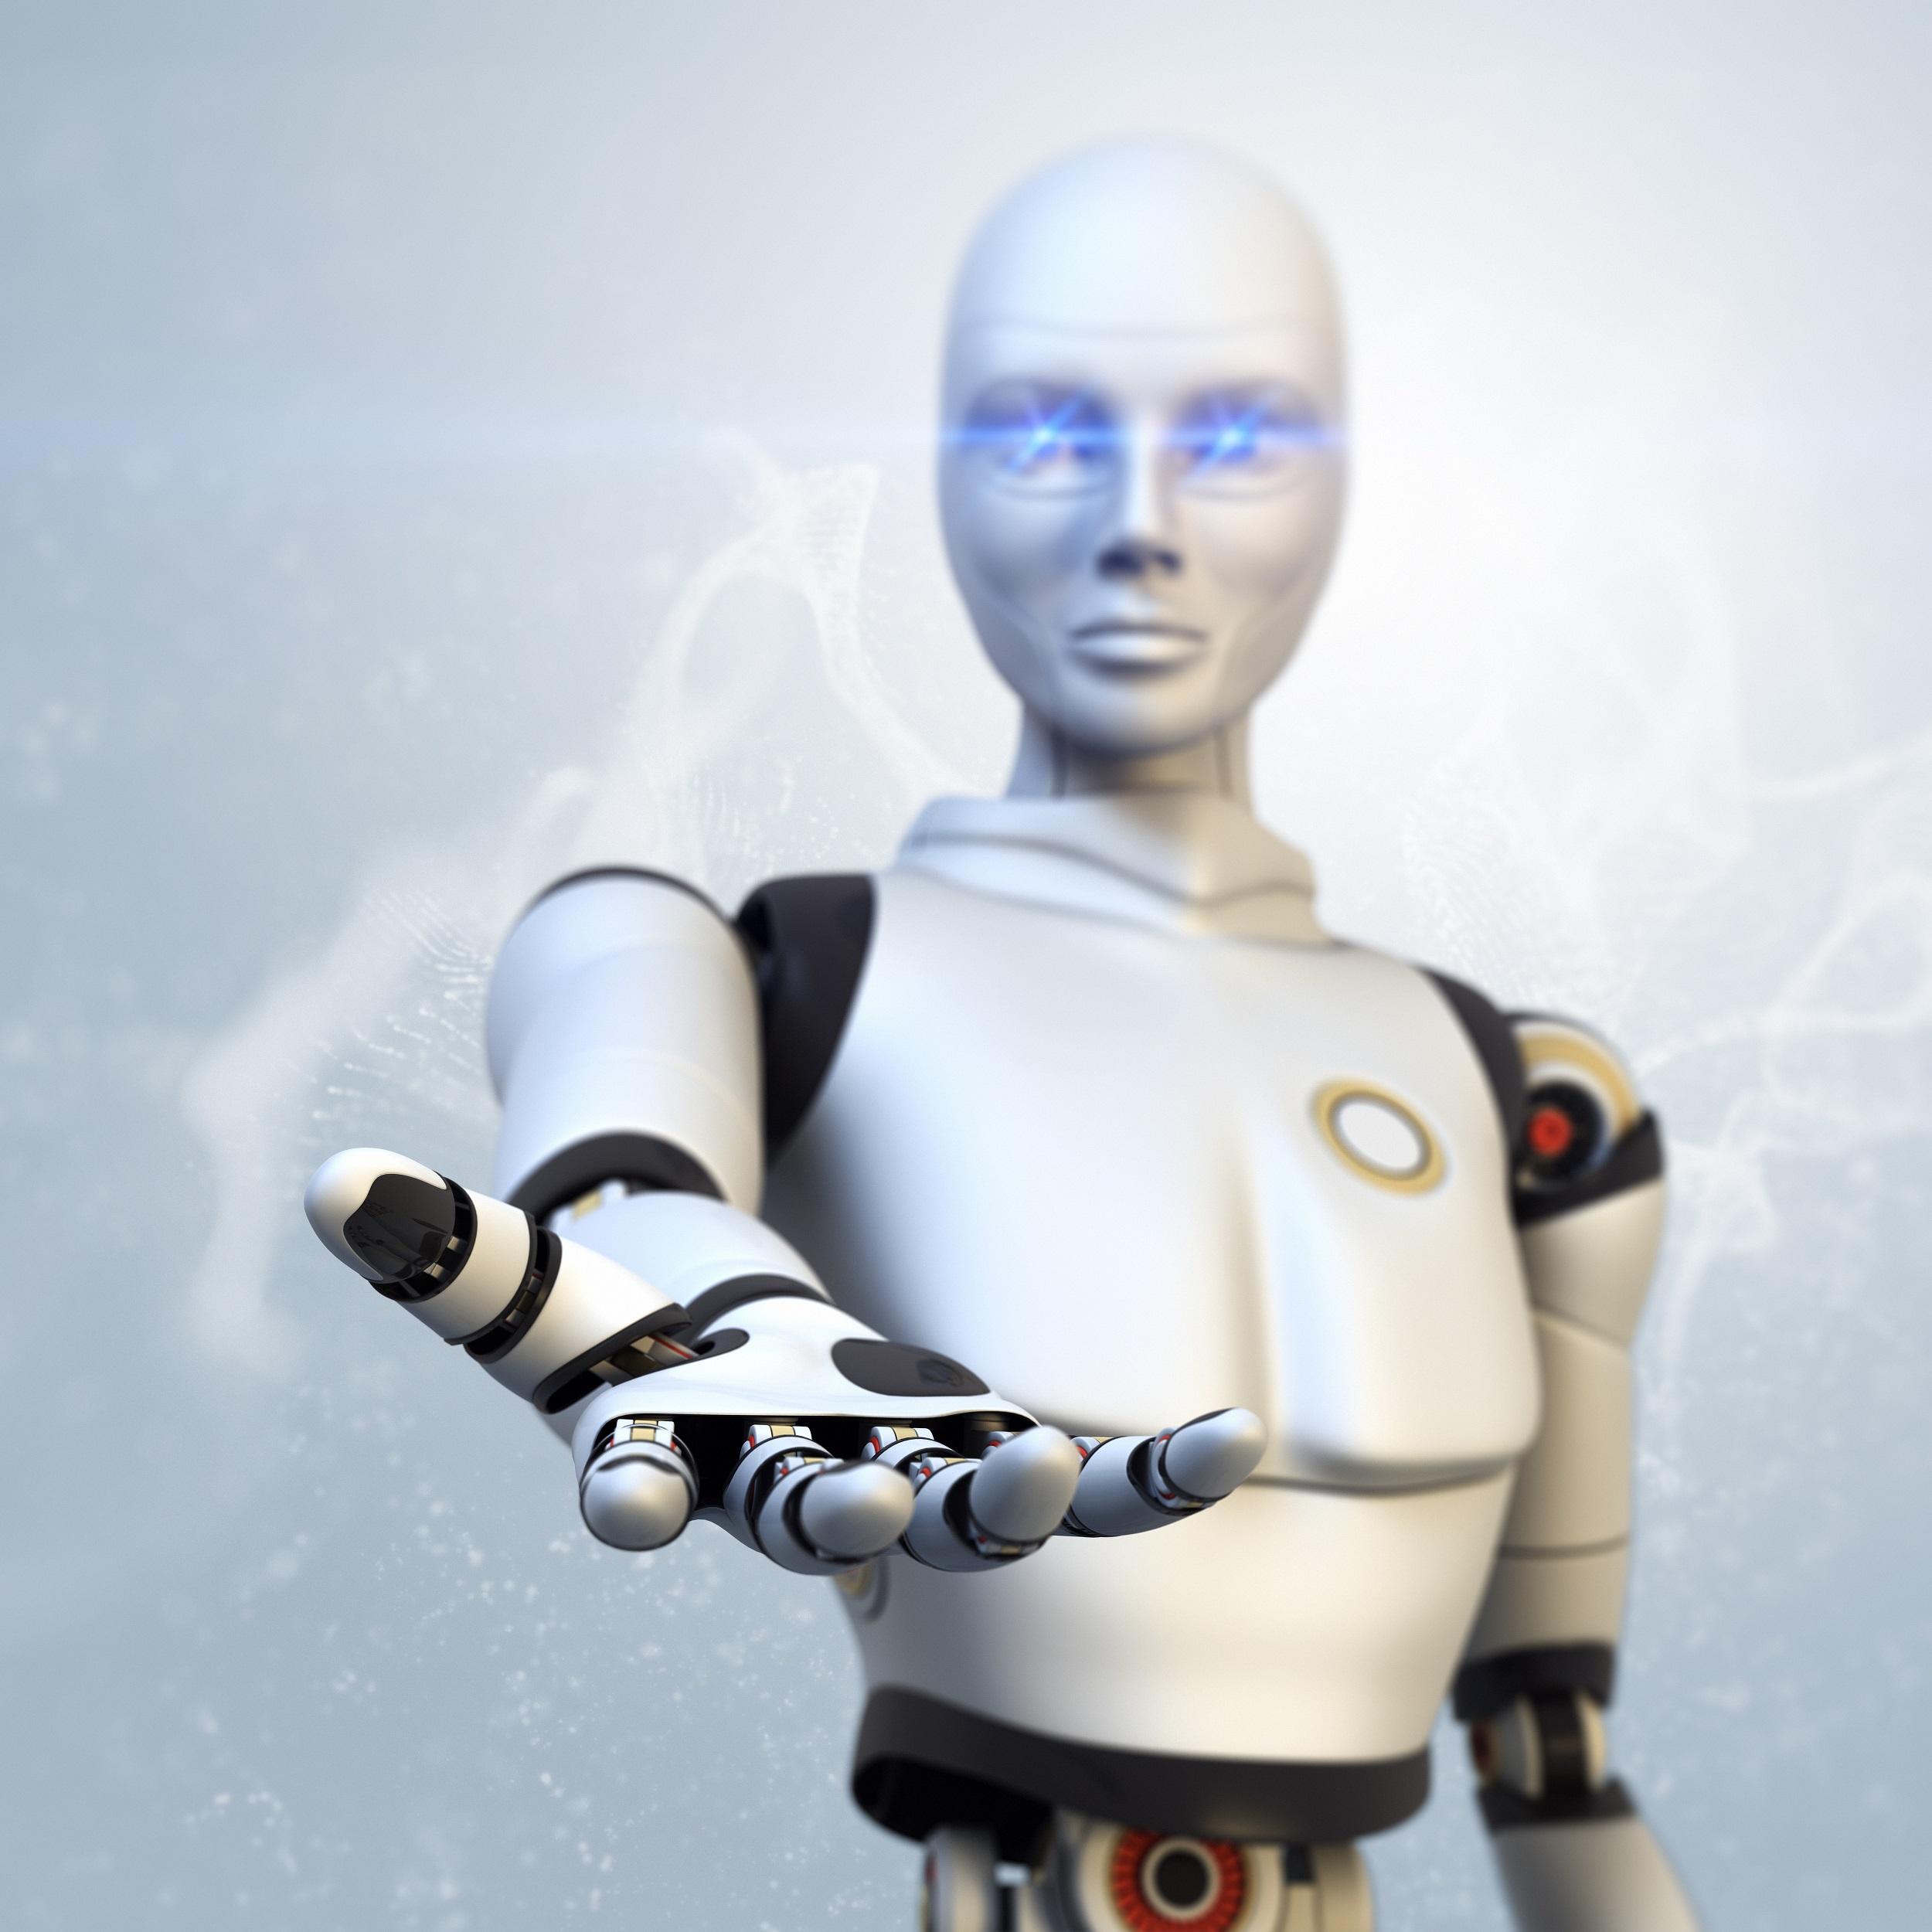 Robot giving his hand